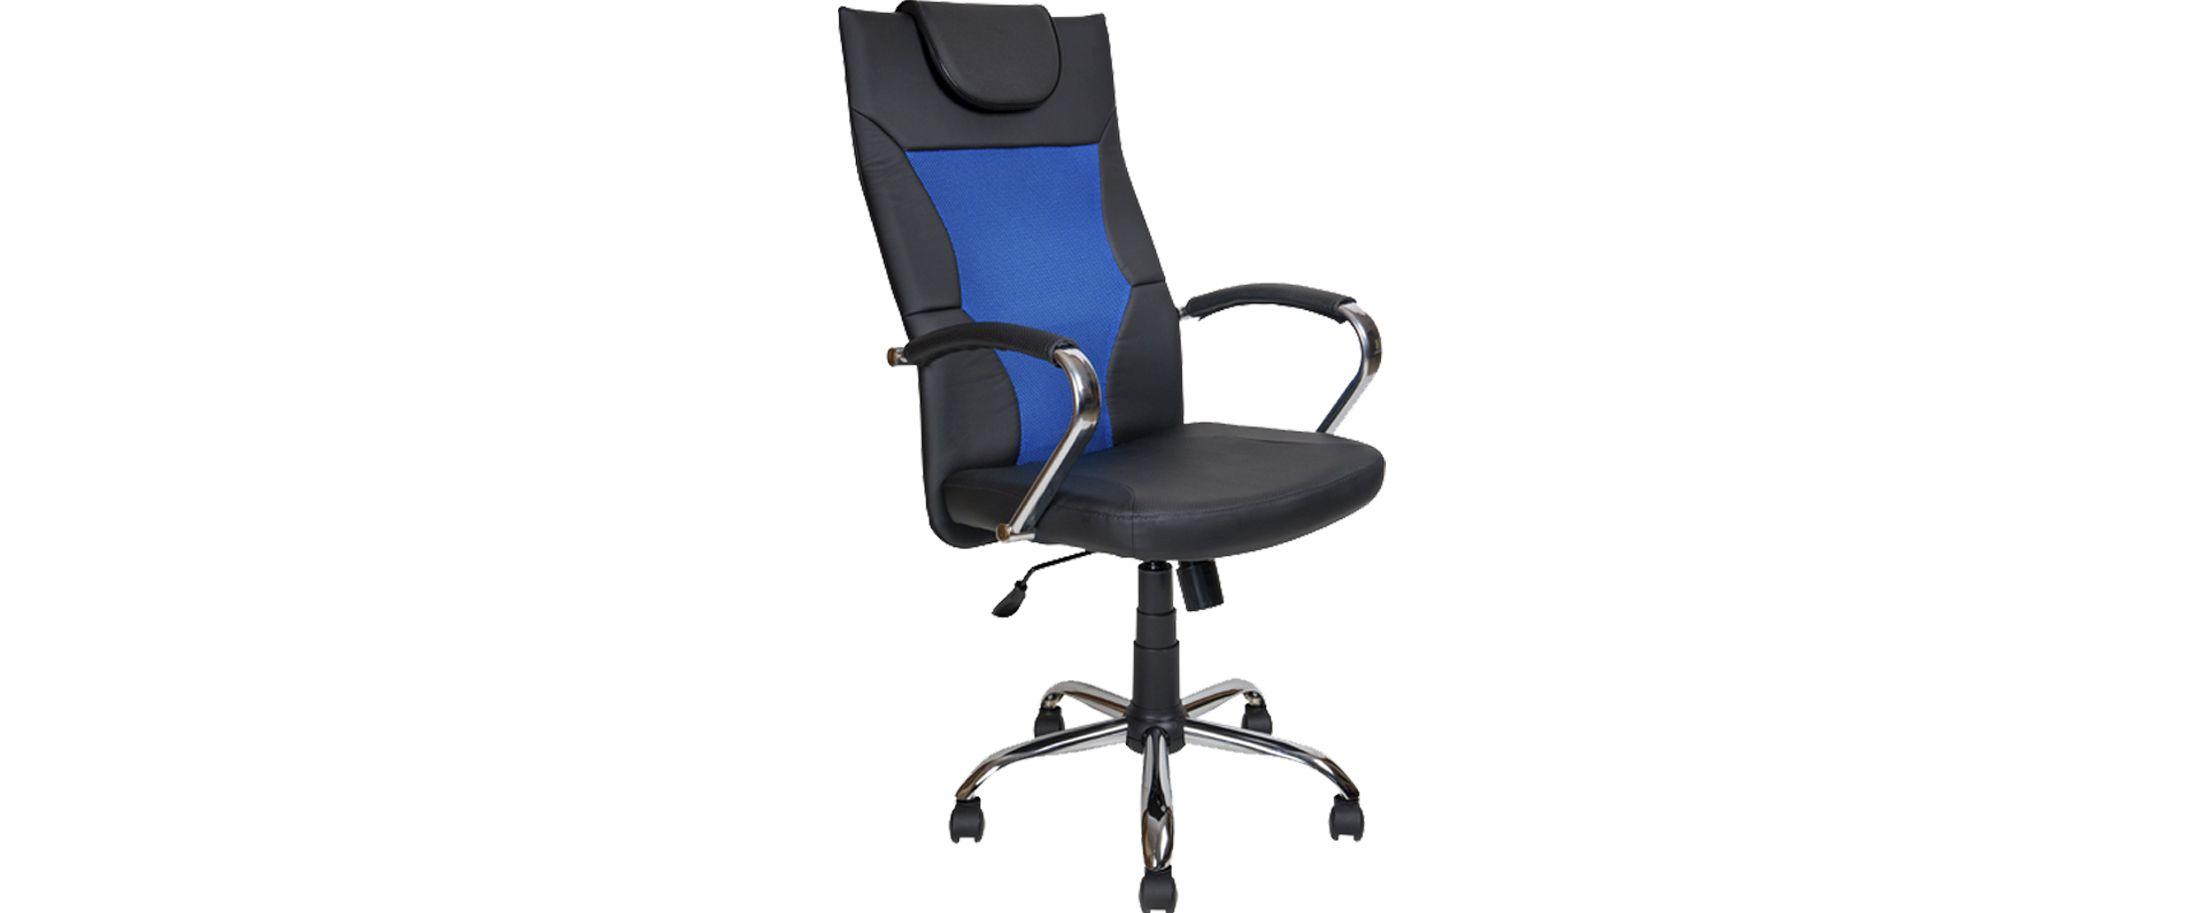 Кресло офисное AV 134 сетка синяя Модель 999Кресло офисное AV 134 сетка синяя Модель 999. Артикул Д000725<br>